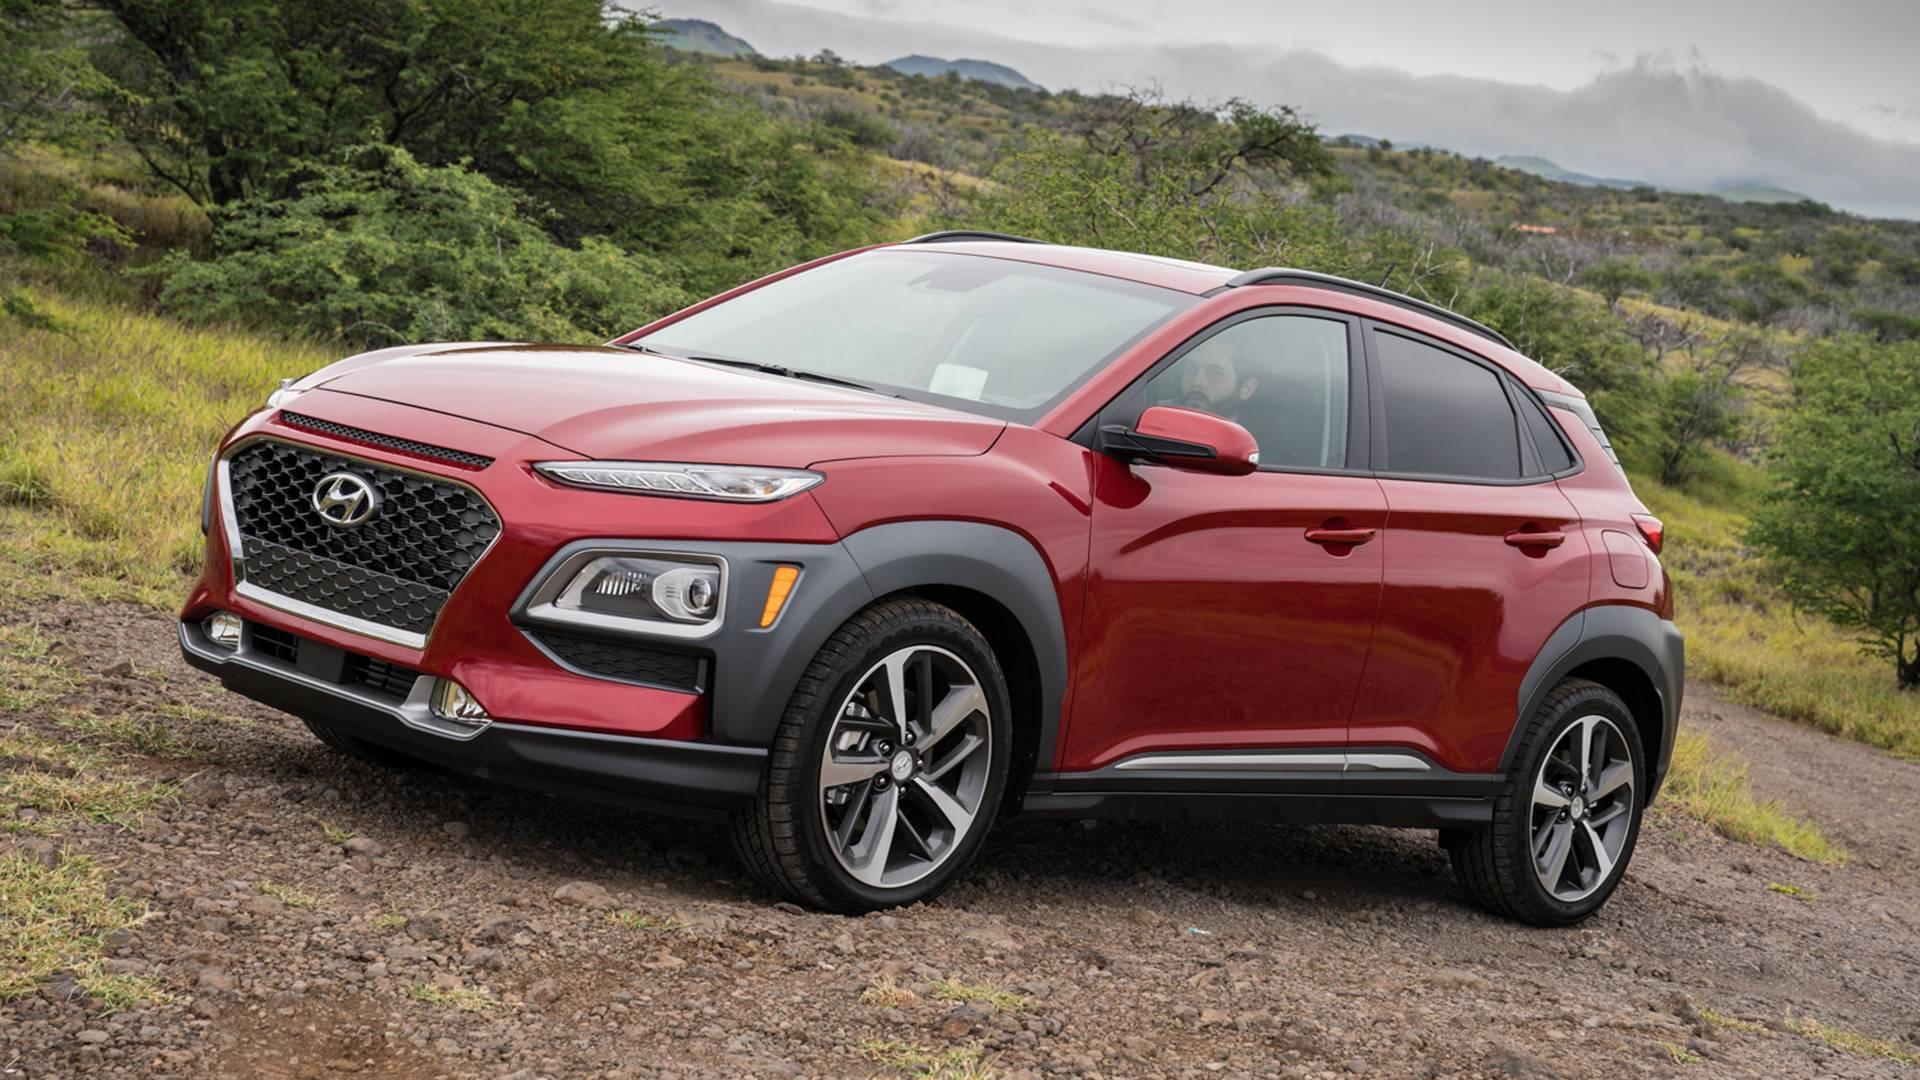 Hyundai Kona News And Reviews